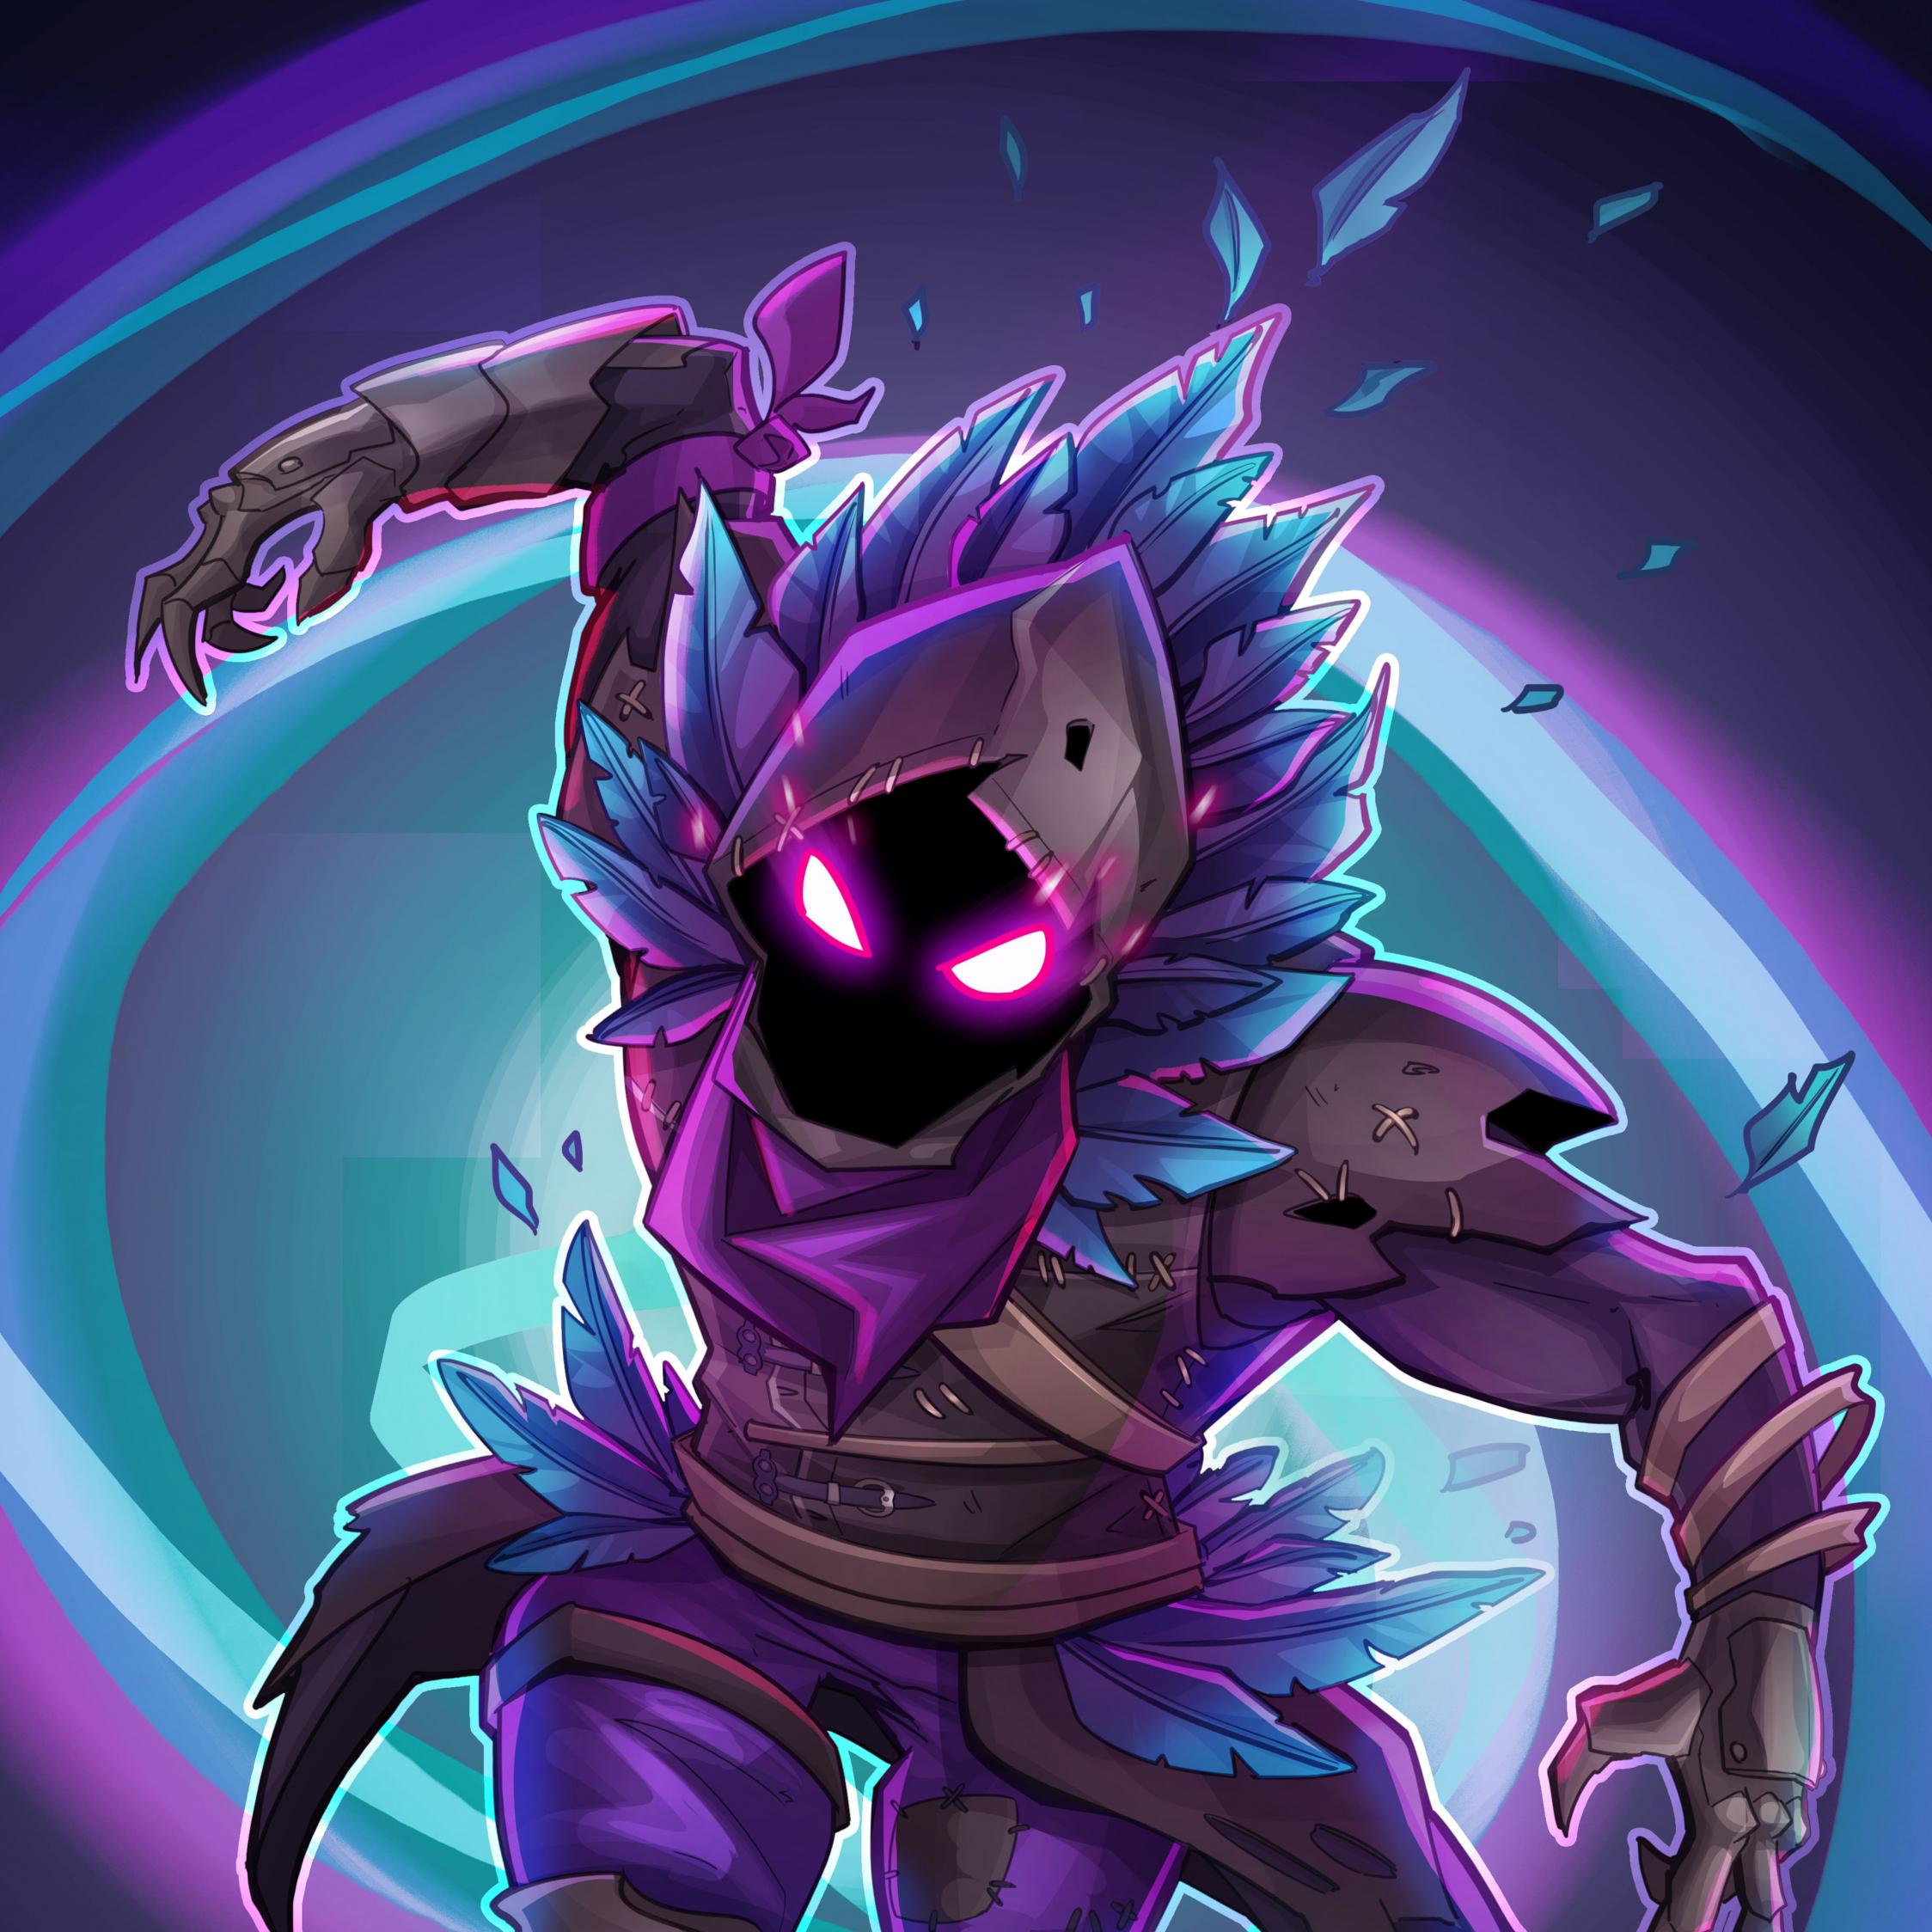 Download 2248x2248 Wallpaper Raven, Fortnite Battle Royale